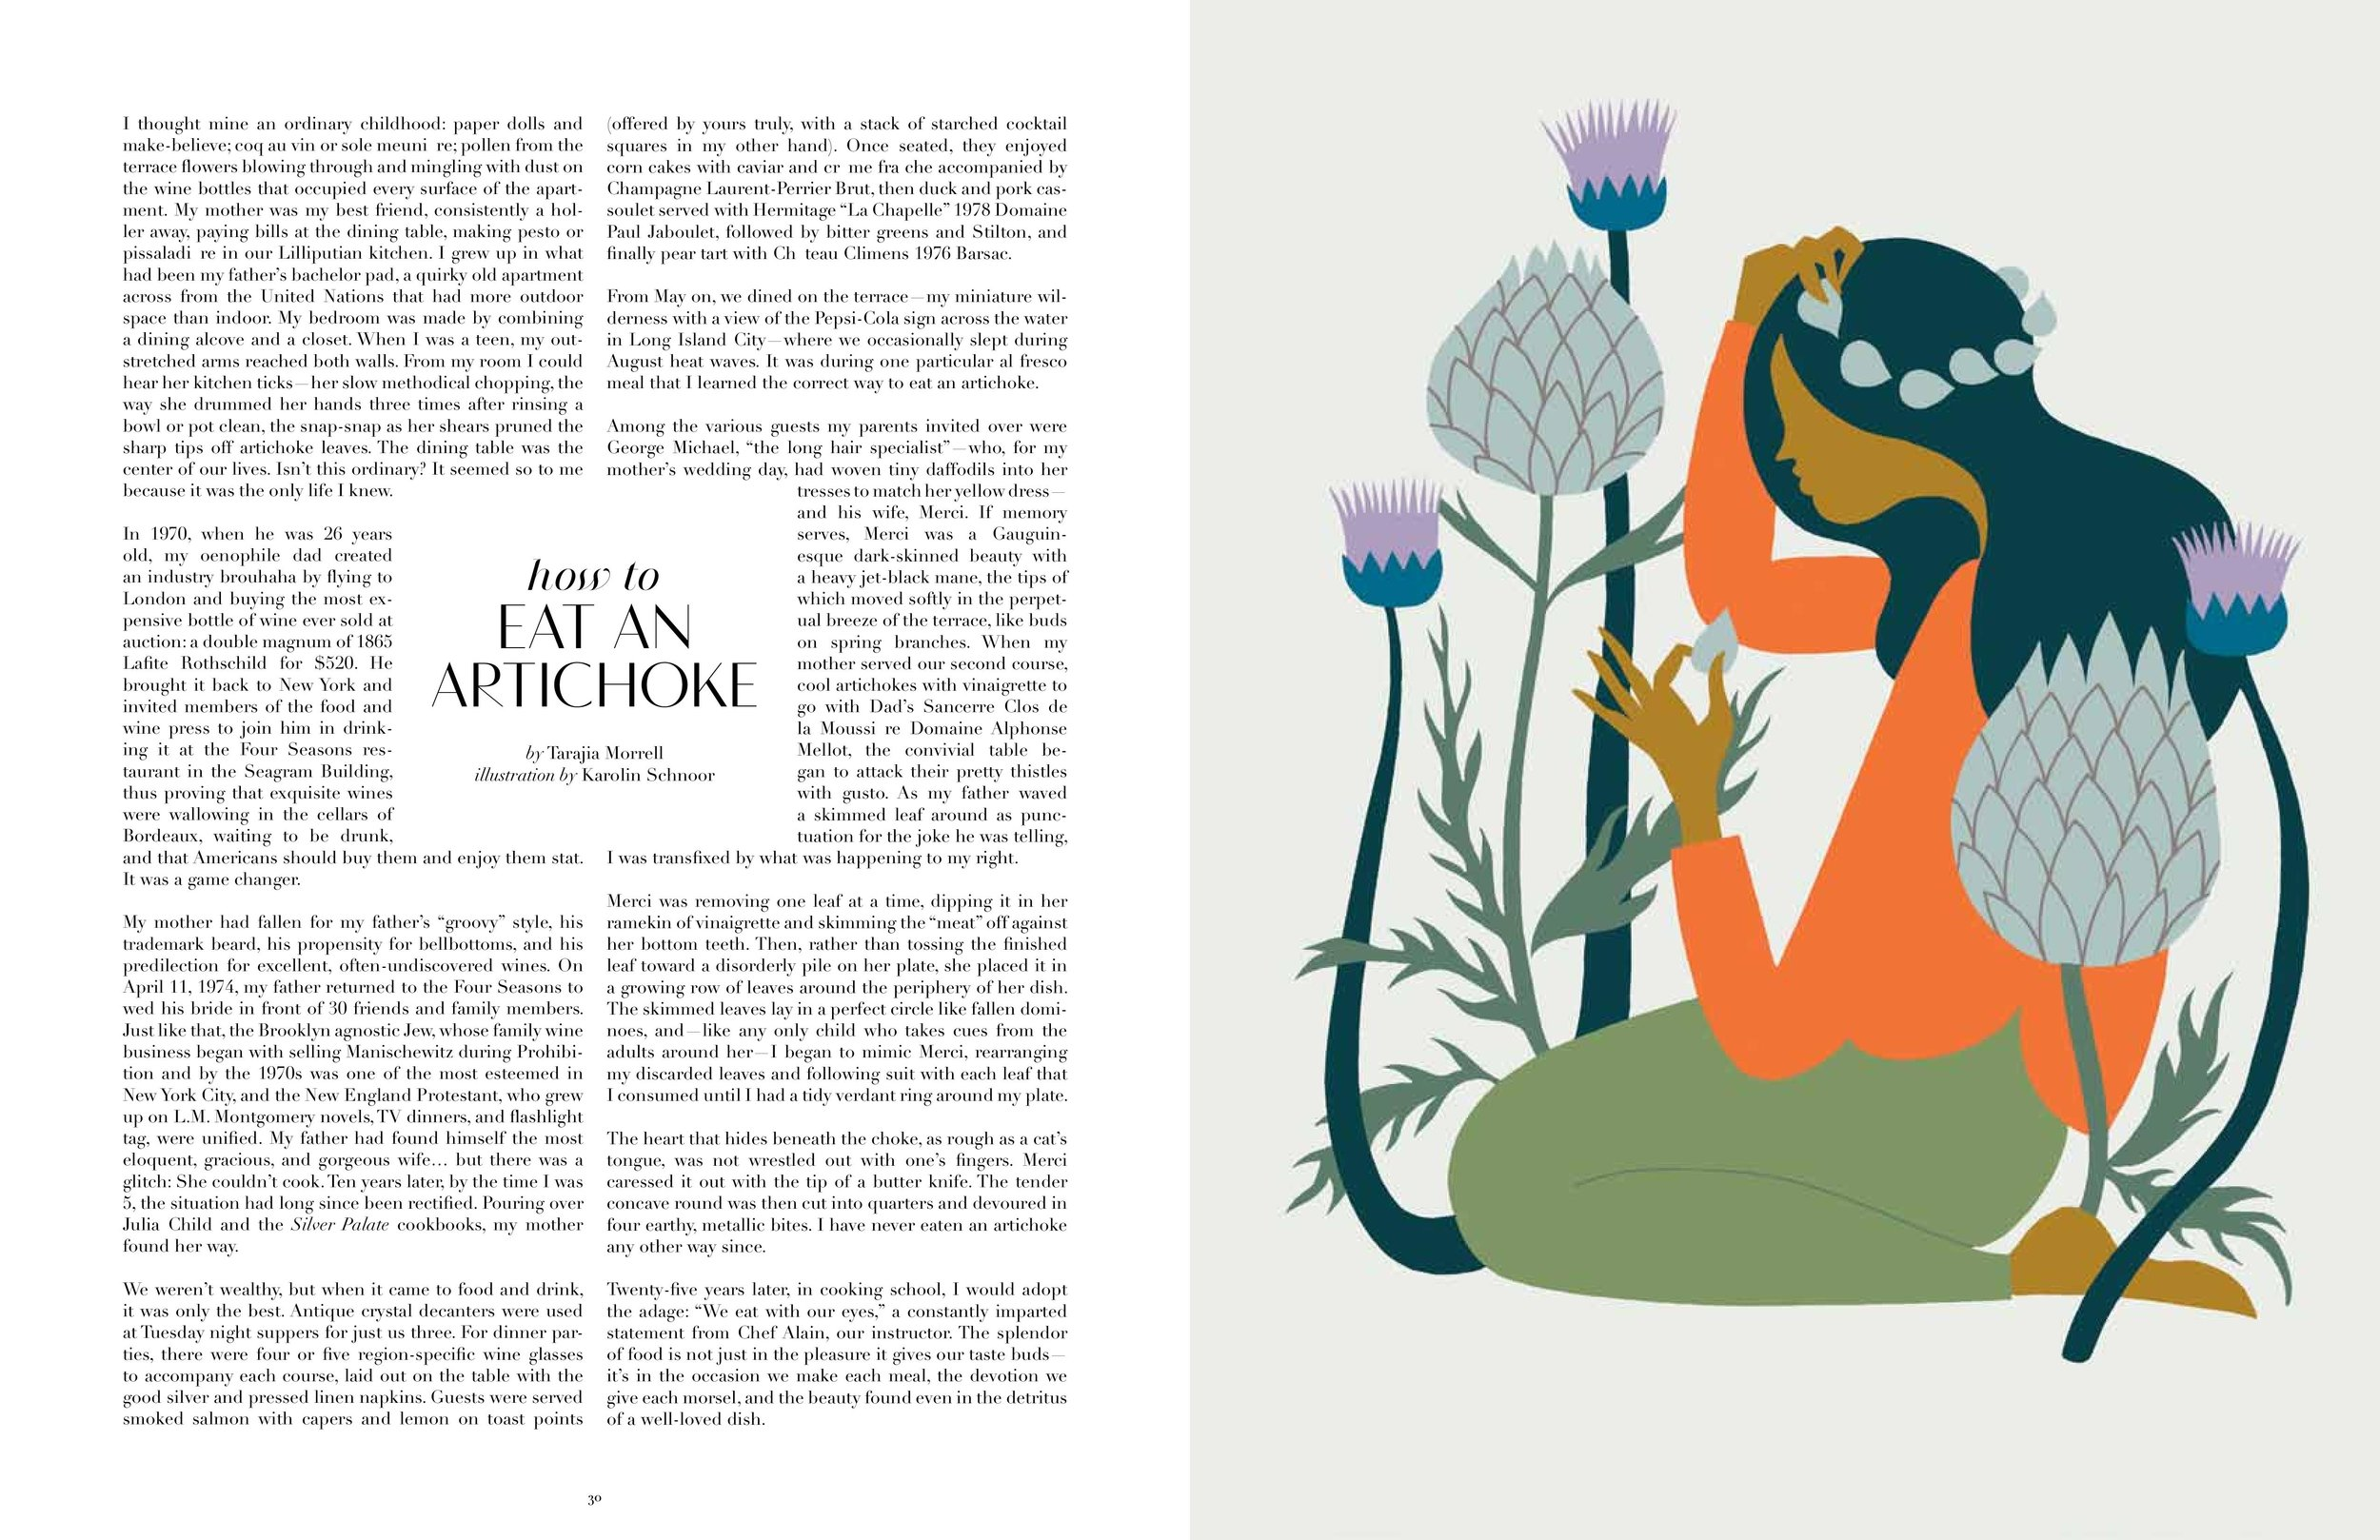 HOW TO EAT AN ARTICHOKE-page-001.jpg